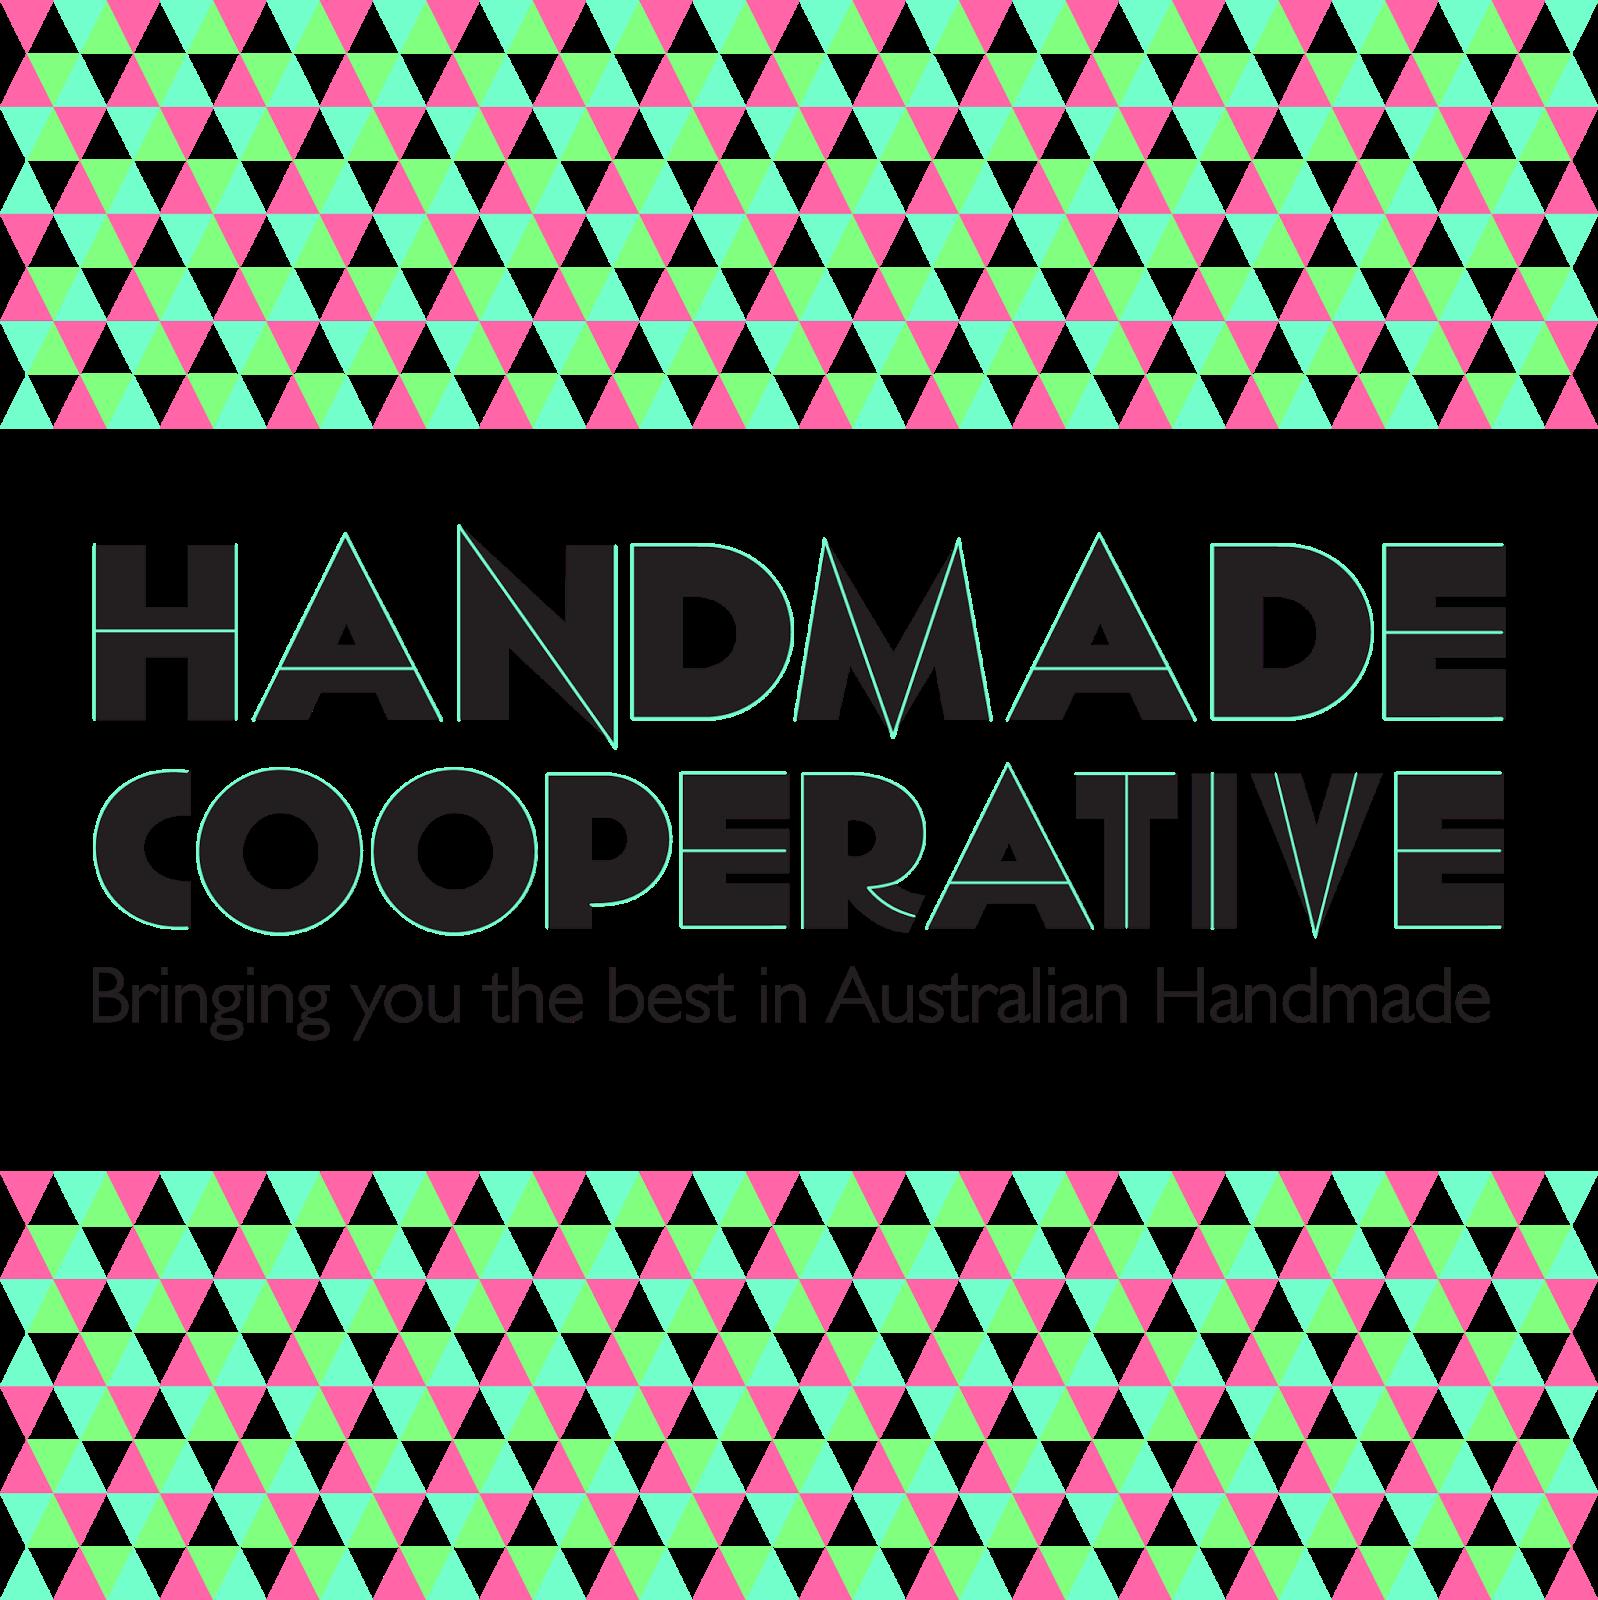 Handmade Cooperative. Bringing you the best in Australian handmade.